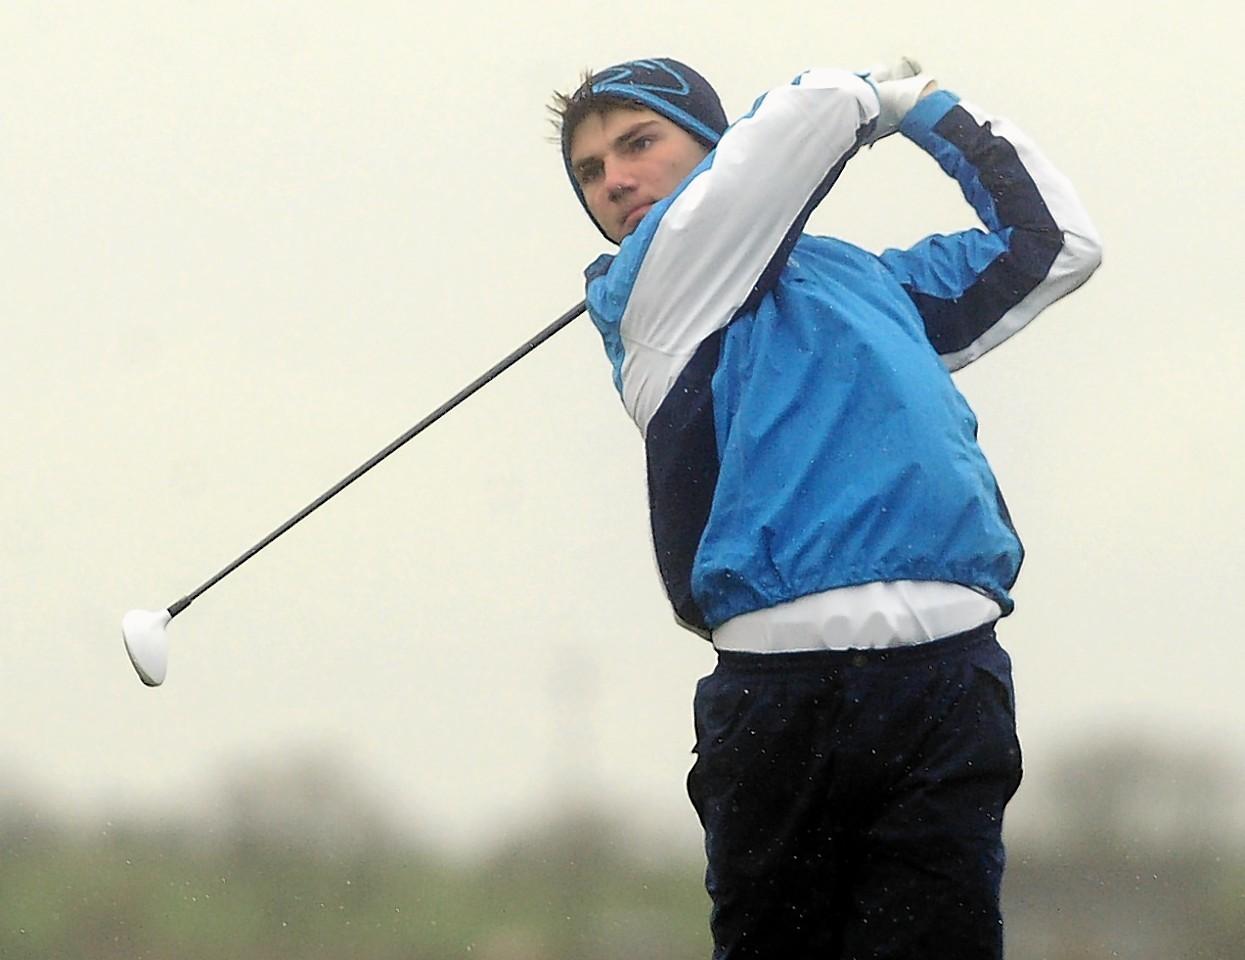 Marc Watt of Inverallochy Golf Club